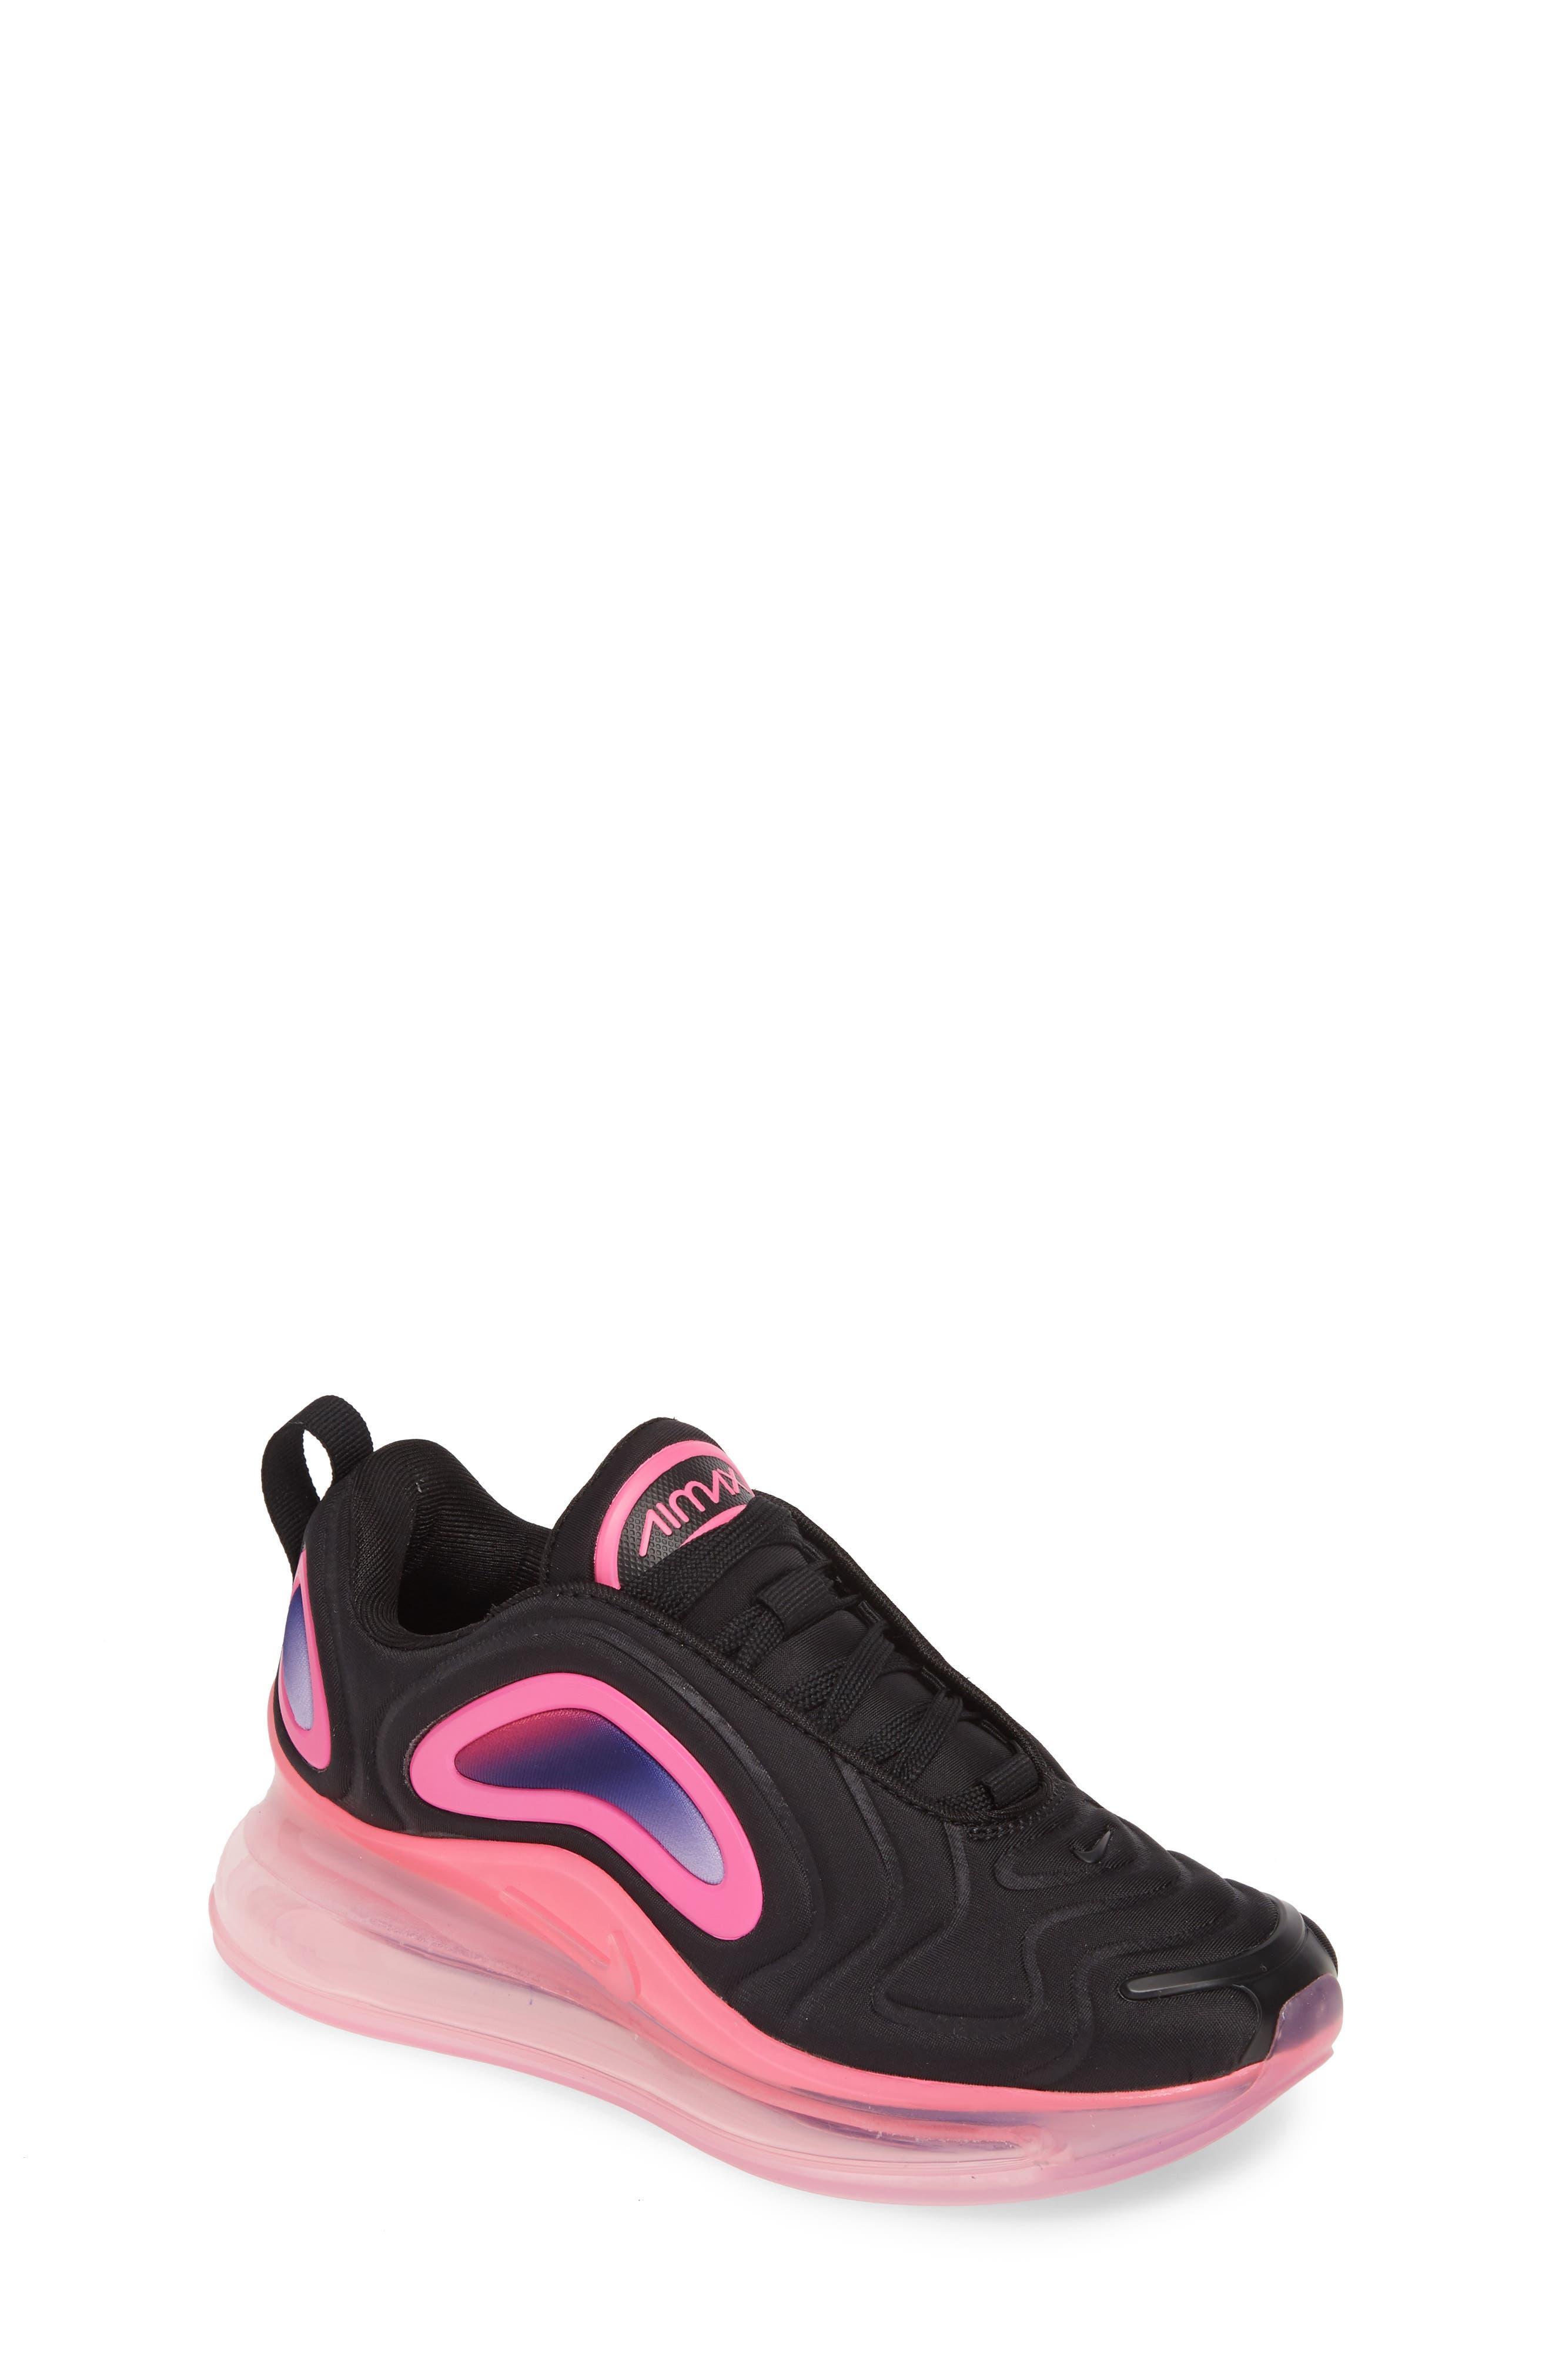 Toddler Nike Air Max 720 Sneaker Size 15 M  Black